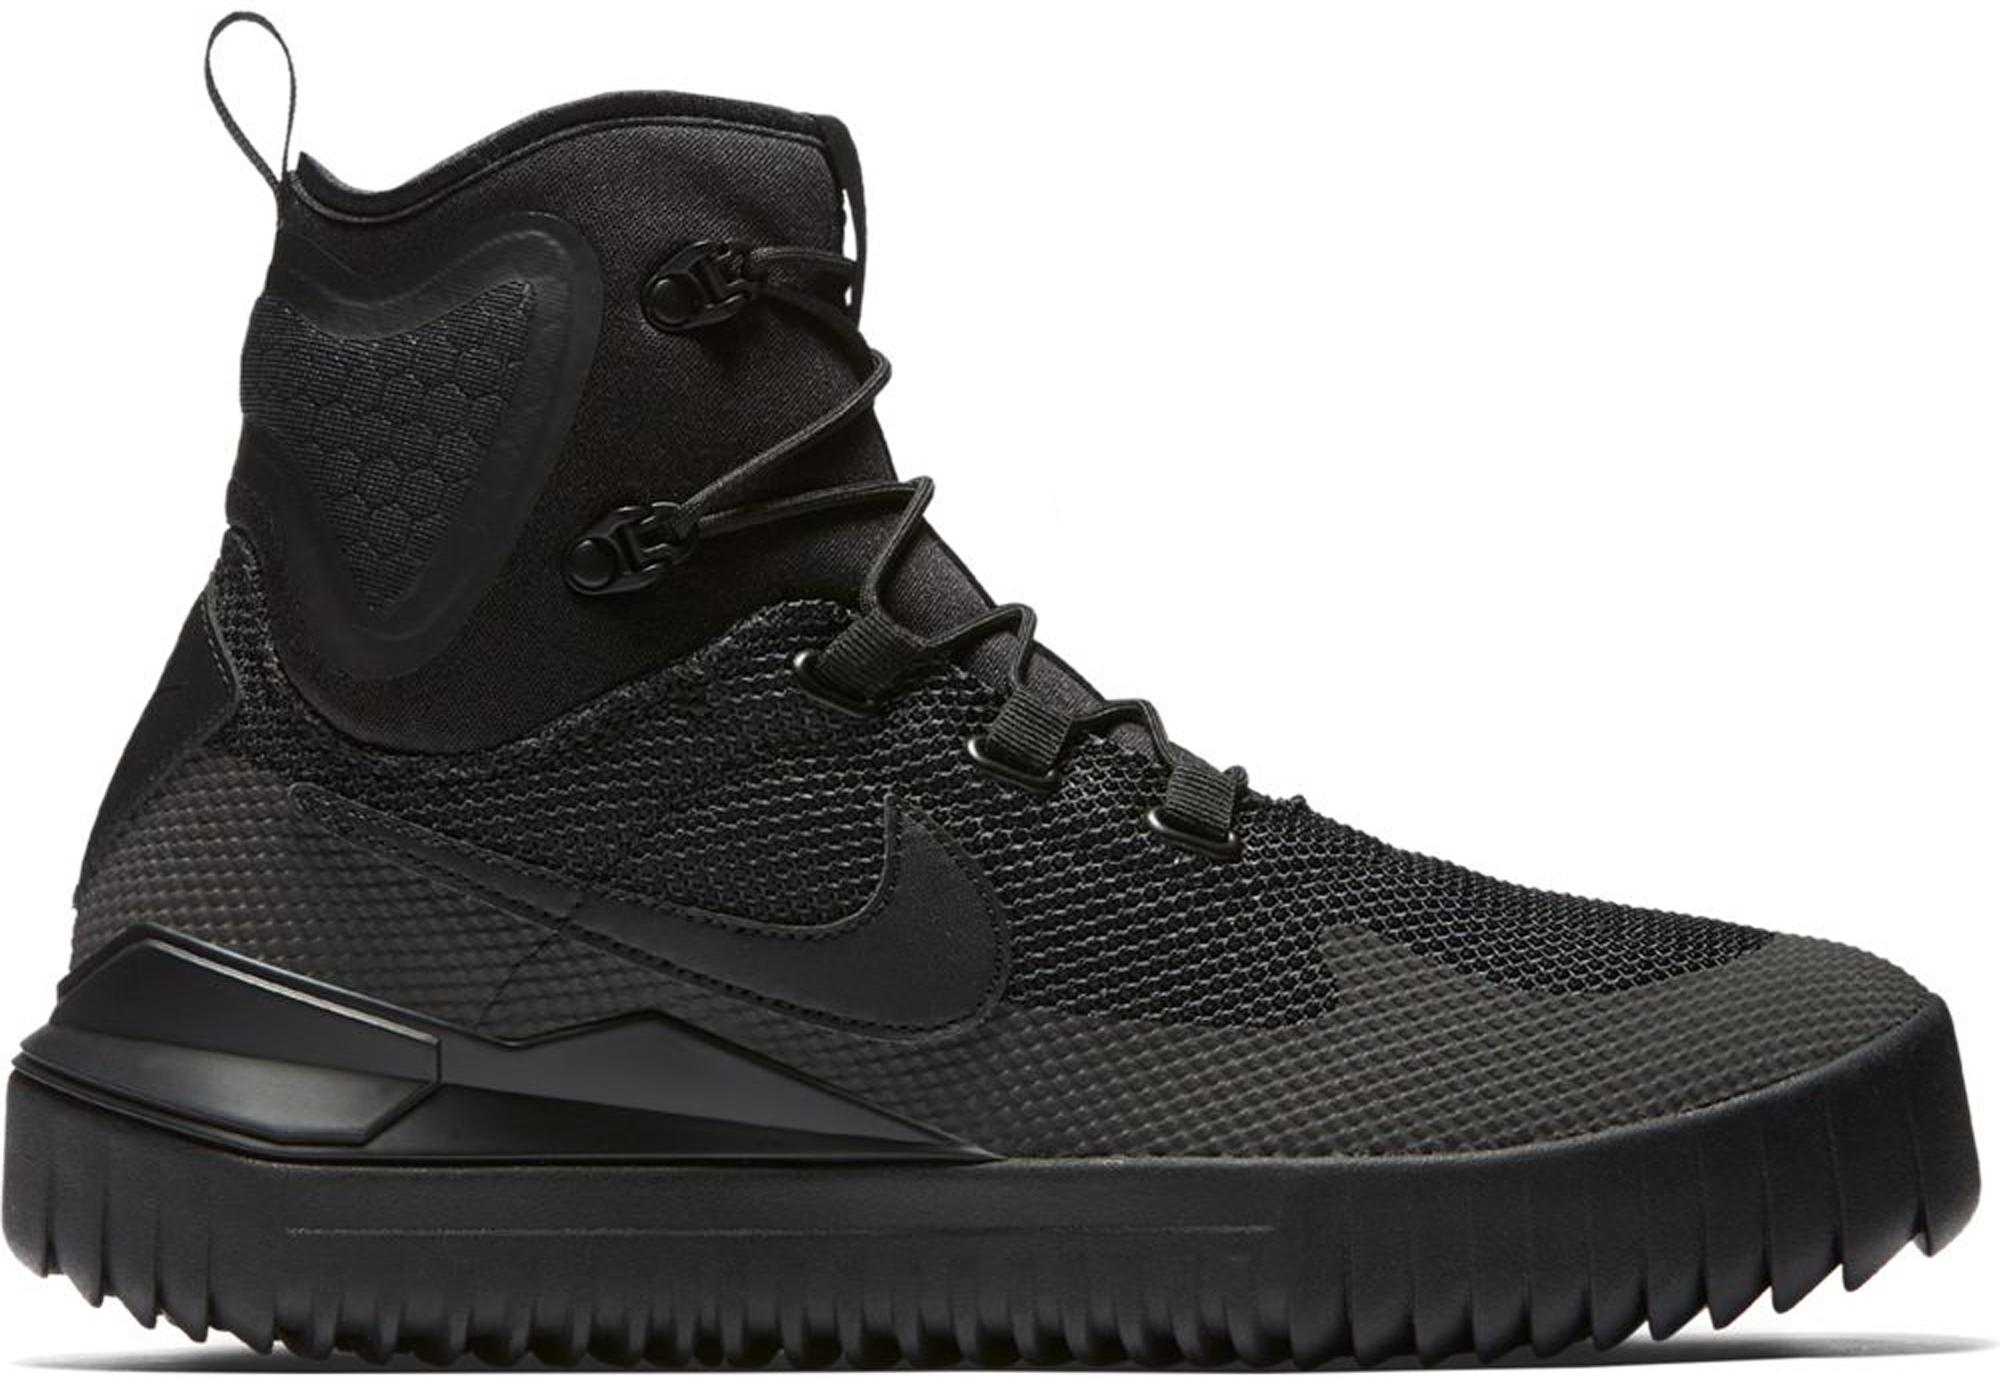 Nike Air Wild Mid Triple Black - 916819-001